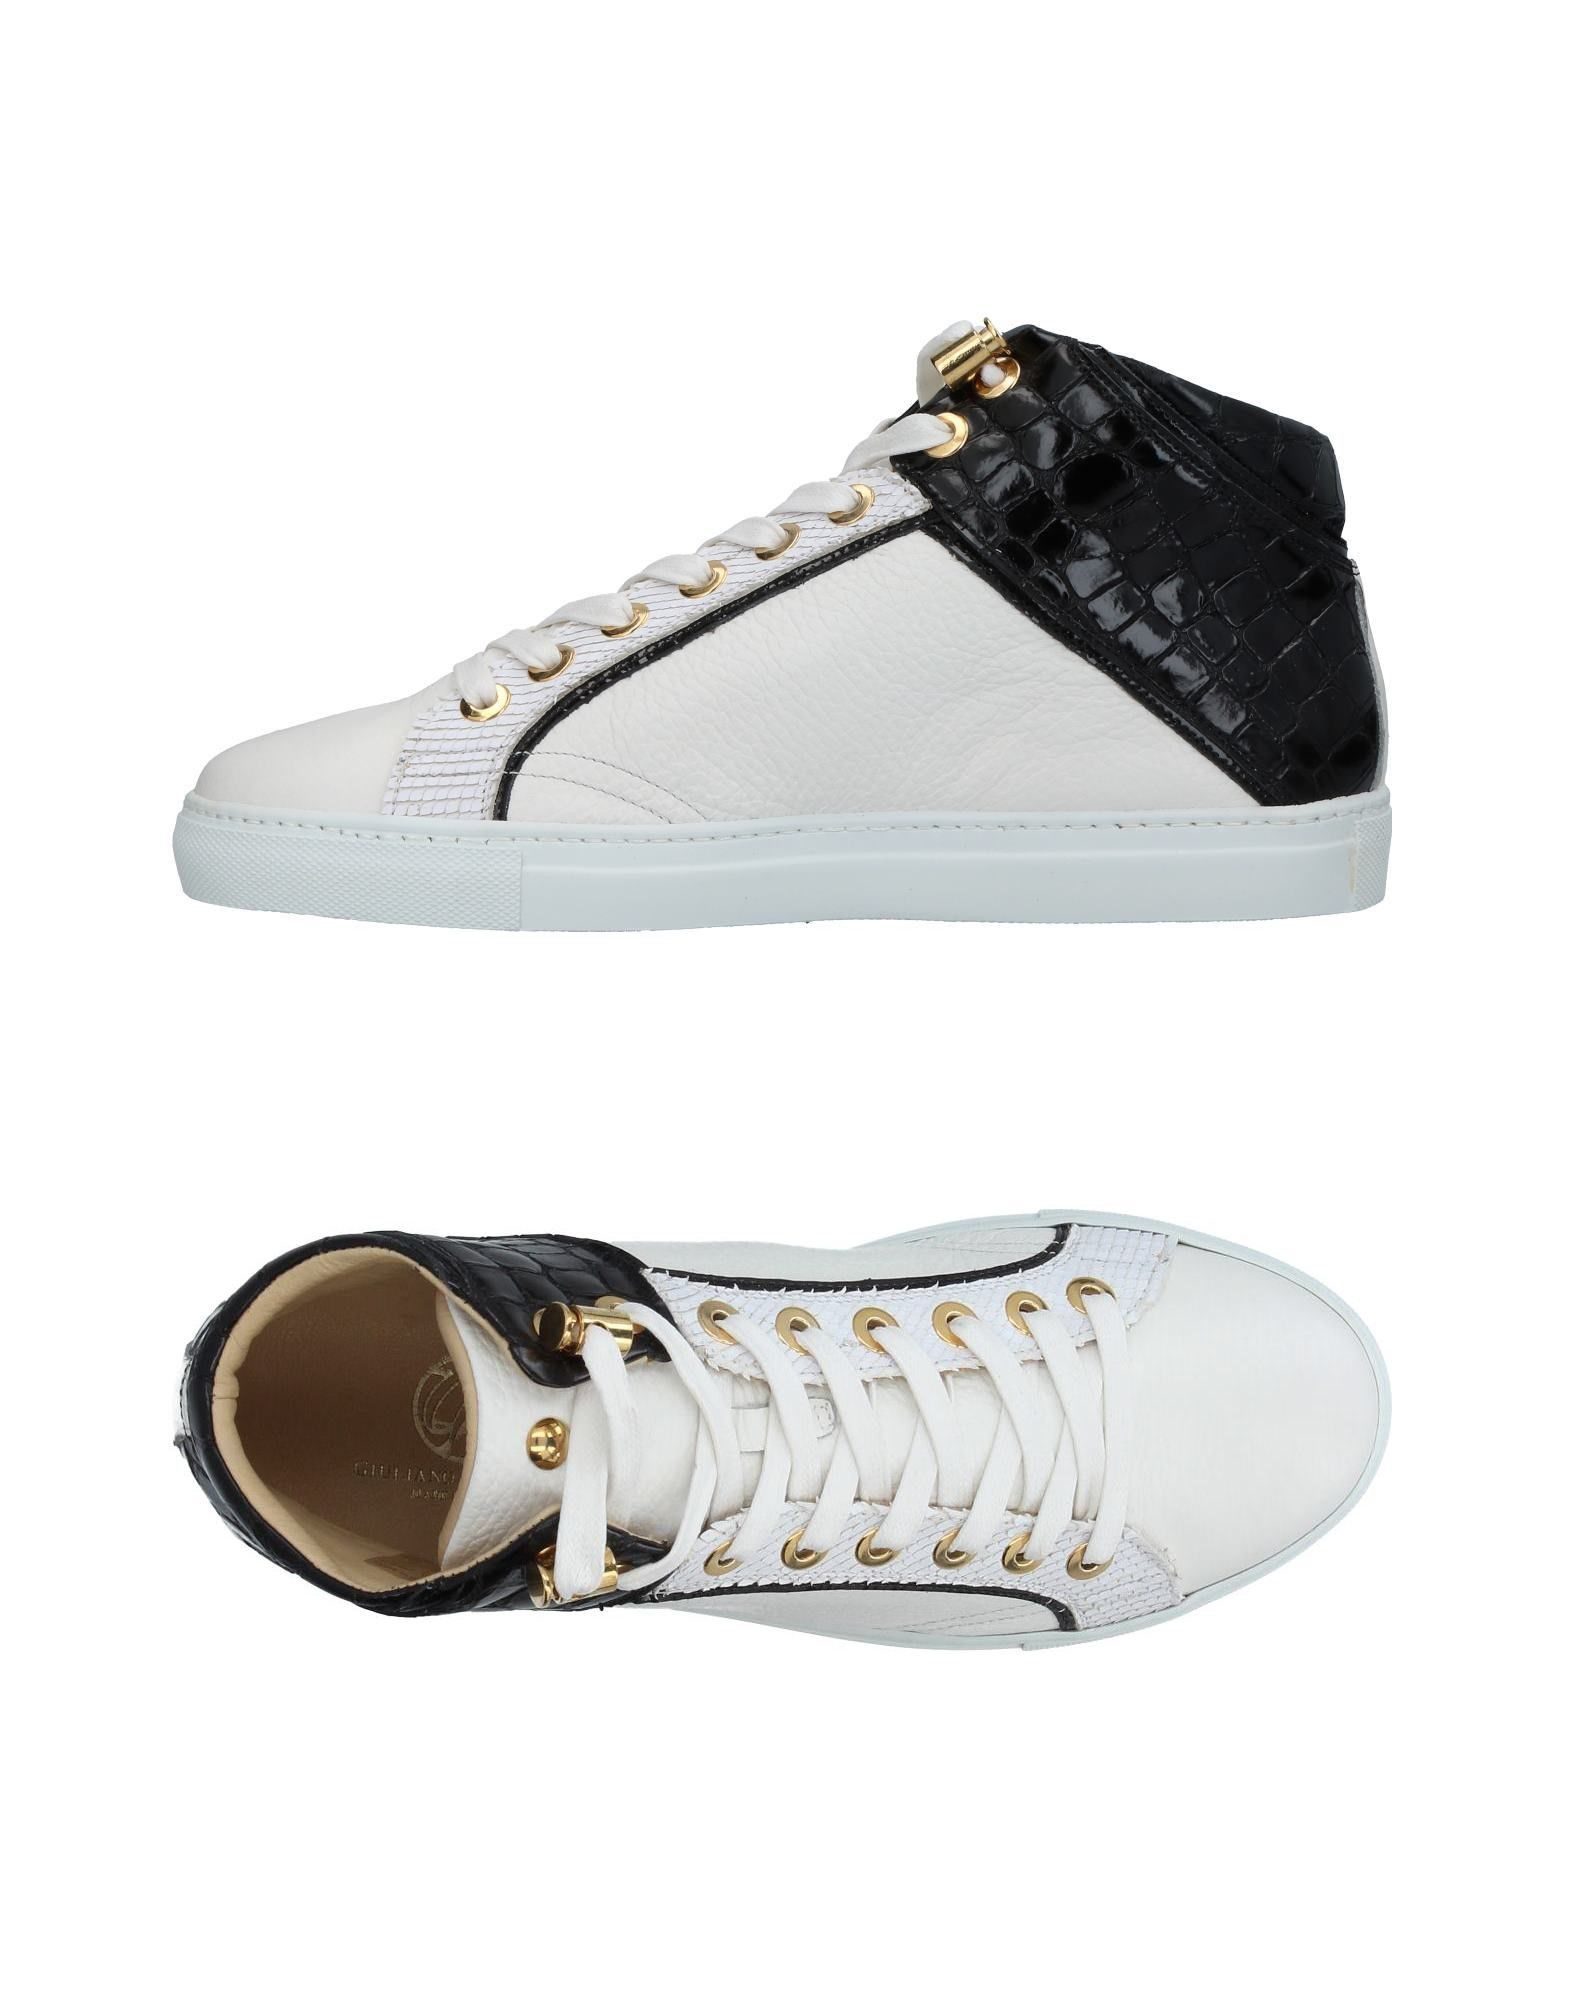 Sneakers Giuliano Galiano Homme - Sneakers Giuliano Galiano  Blanc Meilleur modèle de vente